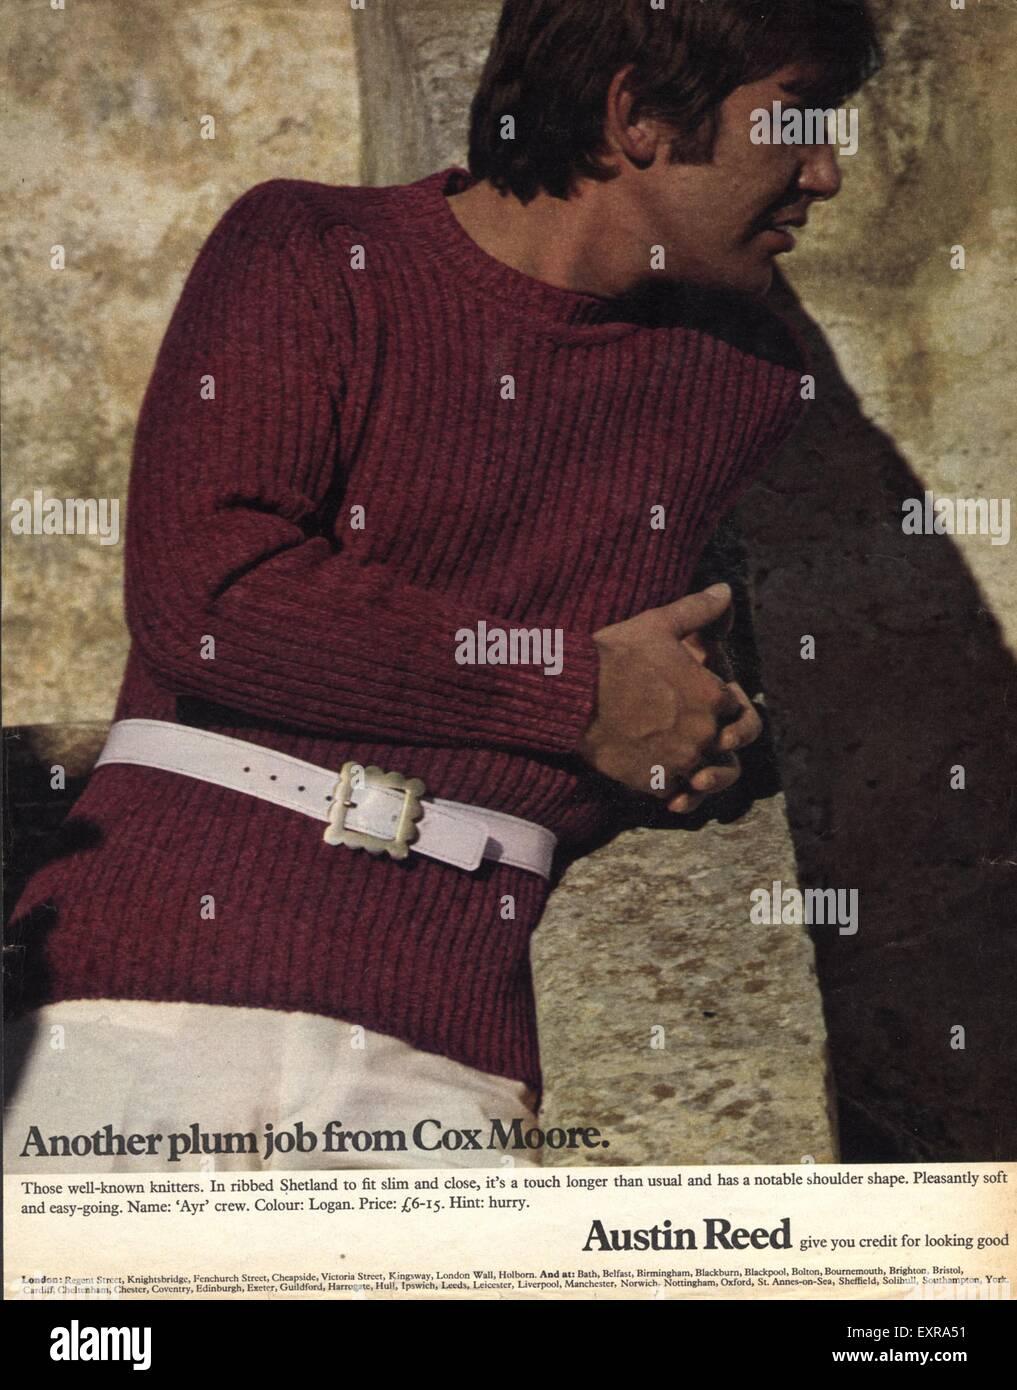 1970s Uk Austin Reed Magazine Advert Stock Photo Alamy